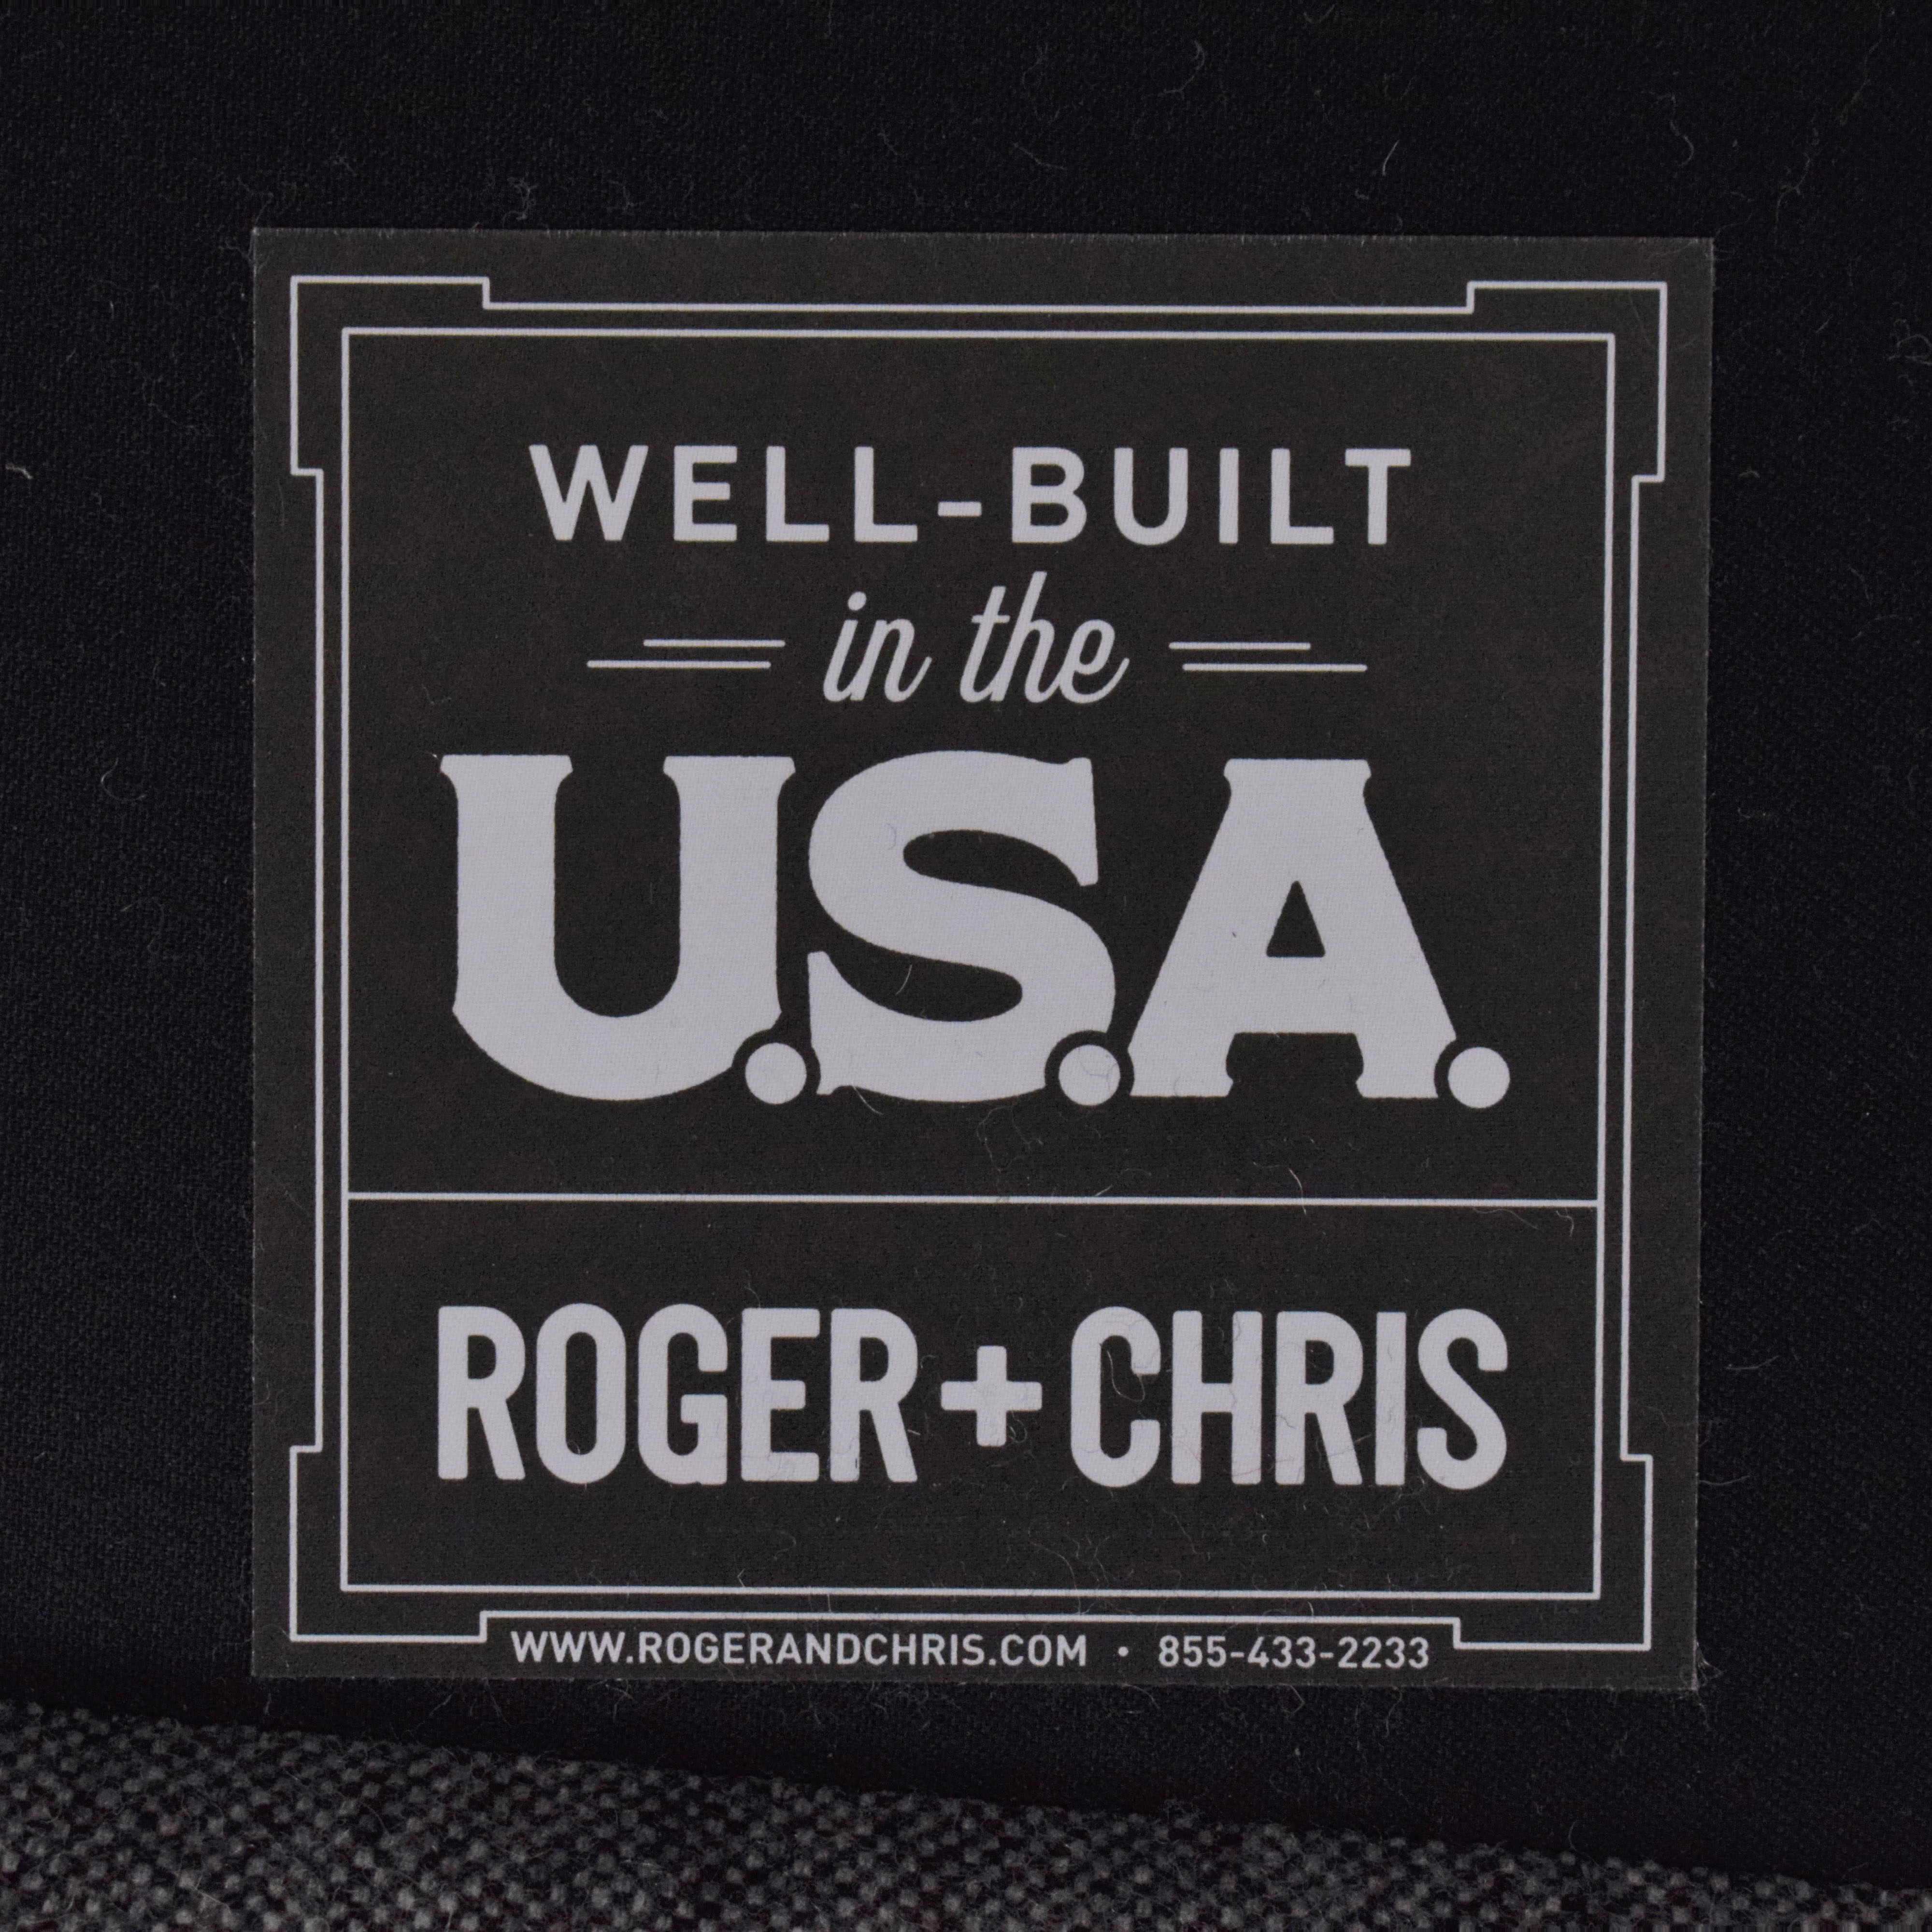 Roger + Chris Roger + Chris Basel Tight Back English Roll Arm Loveseat used